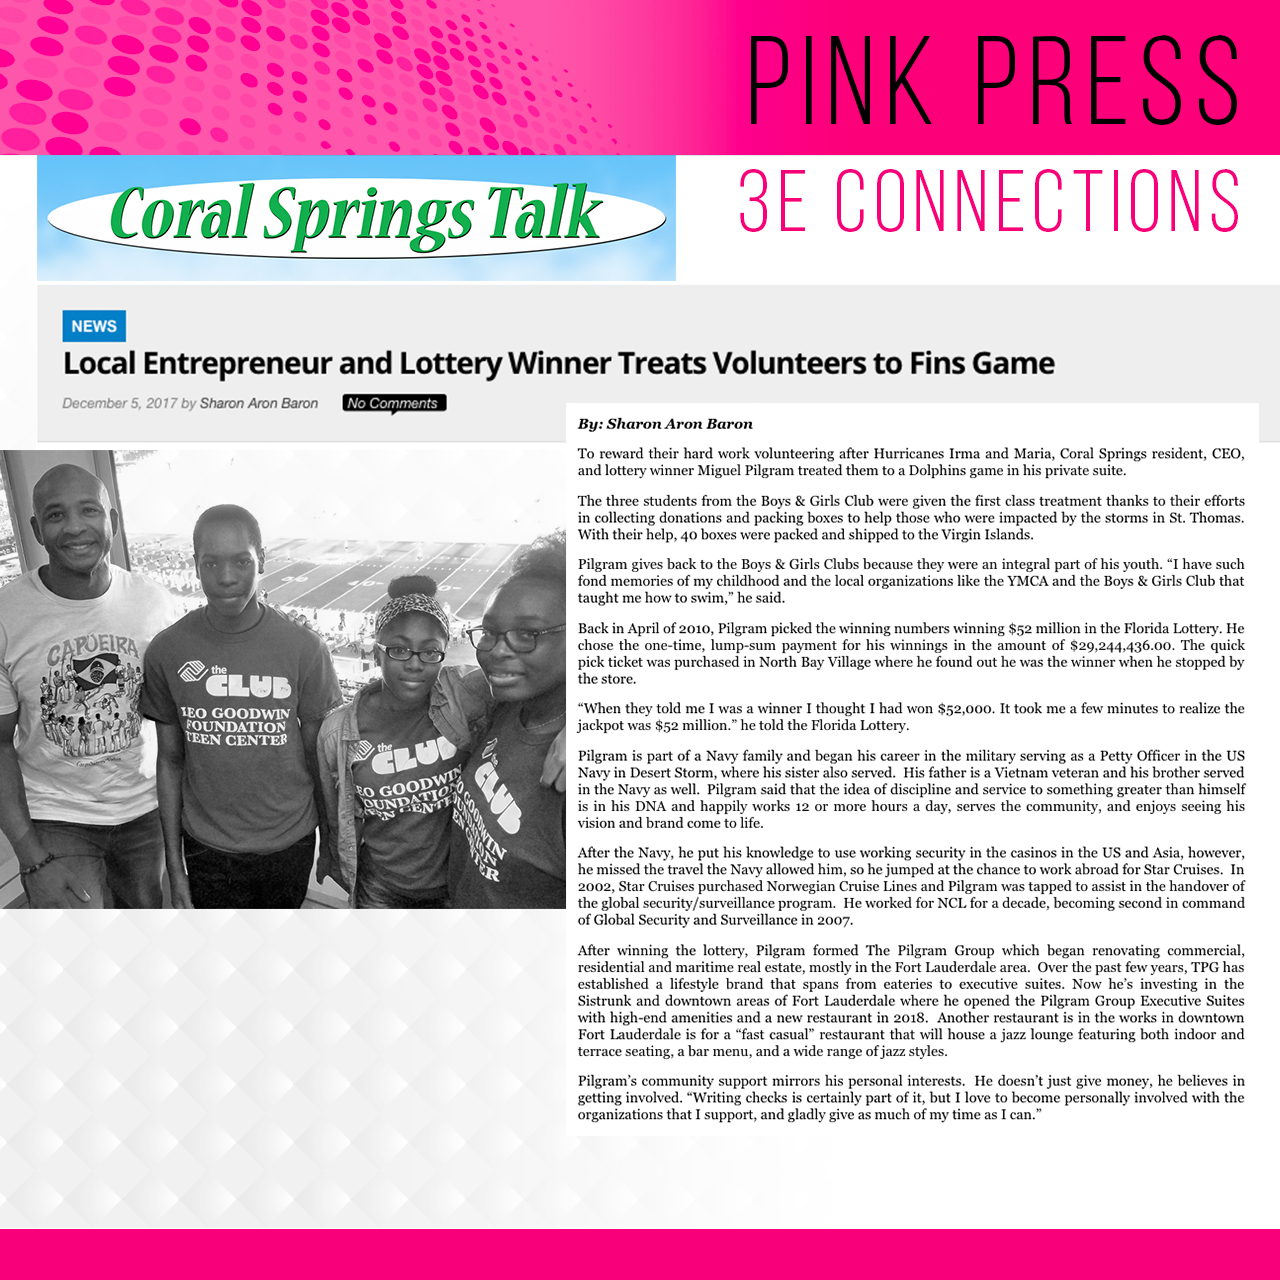 PinkPress_CSprings.png